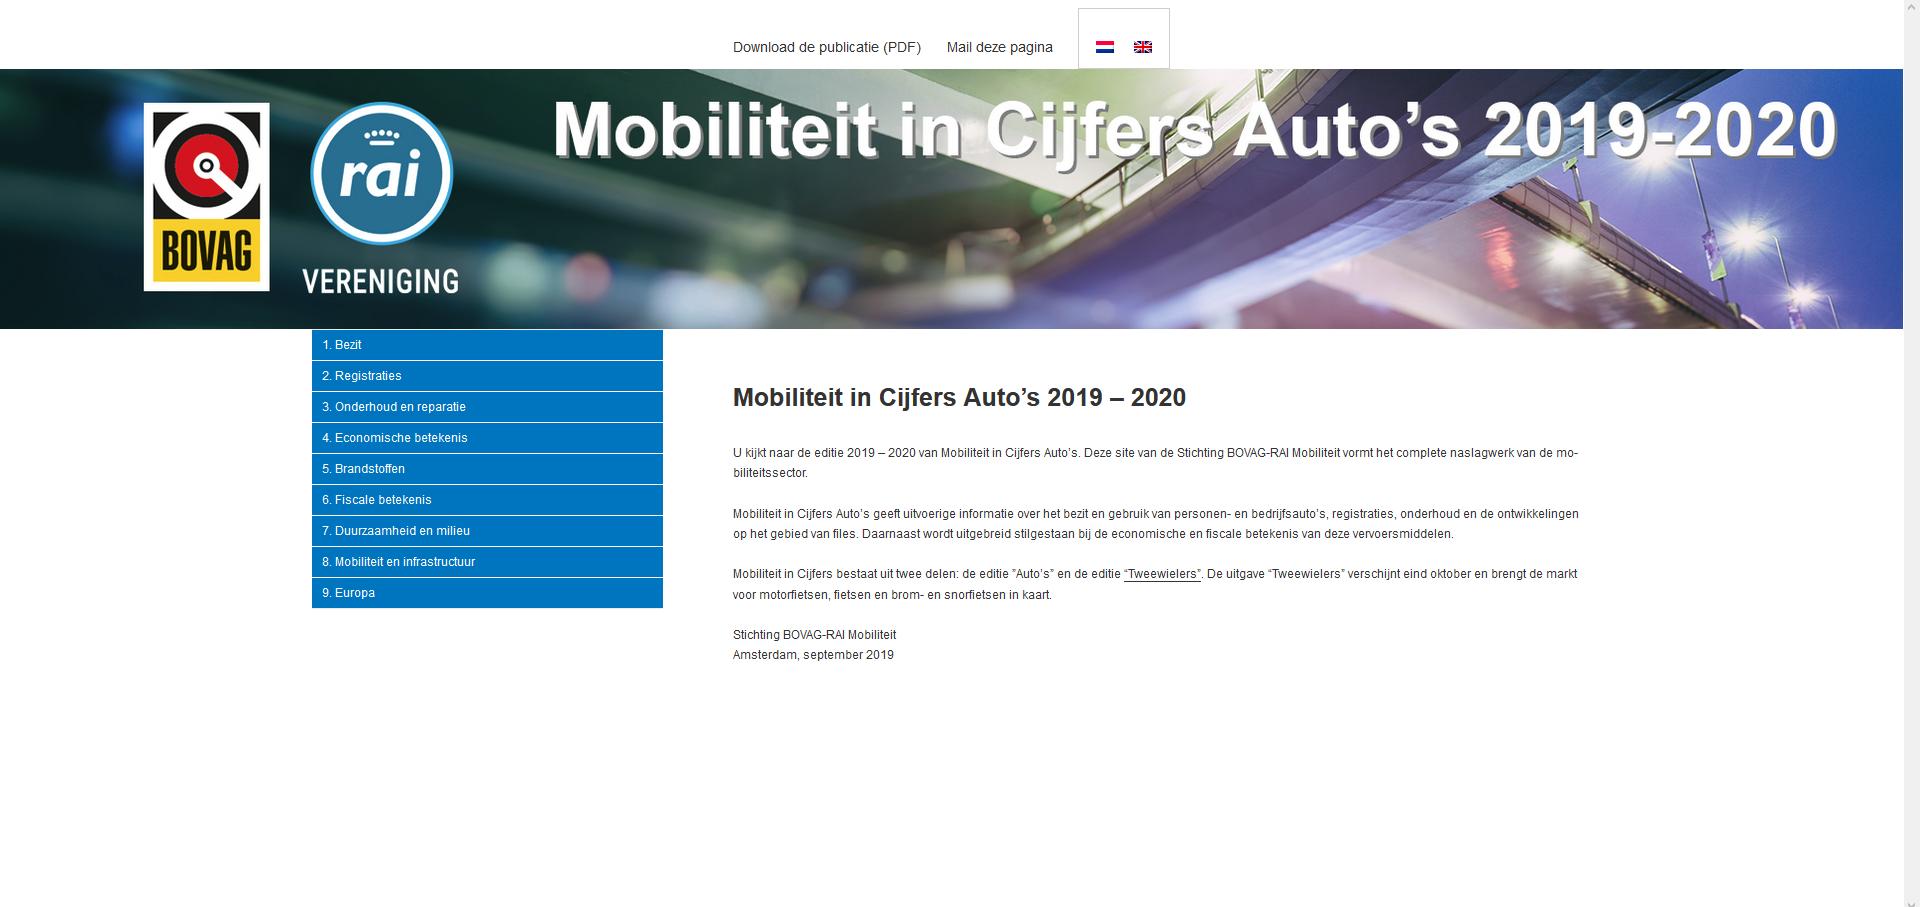 Mobiliteit in Cijfers Auto 2019